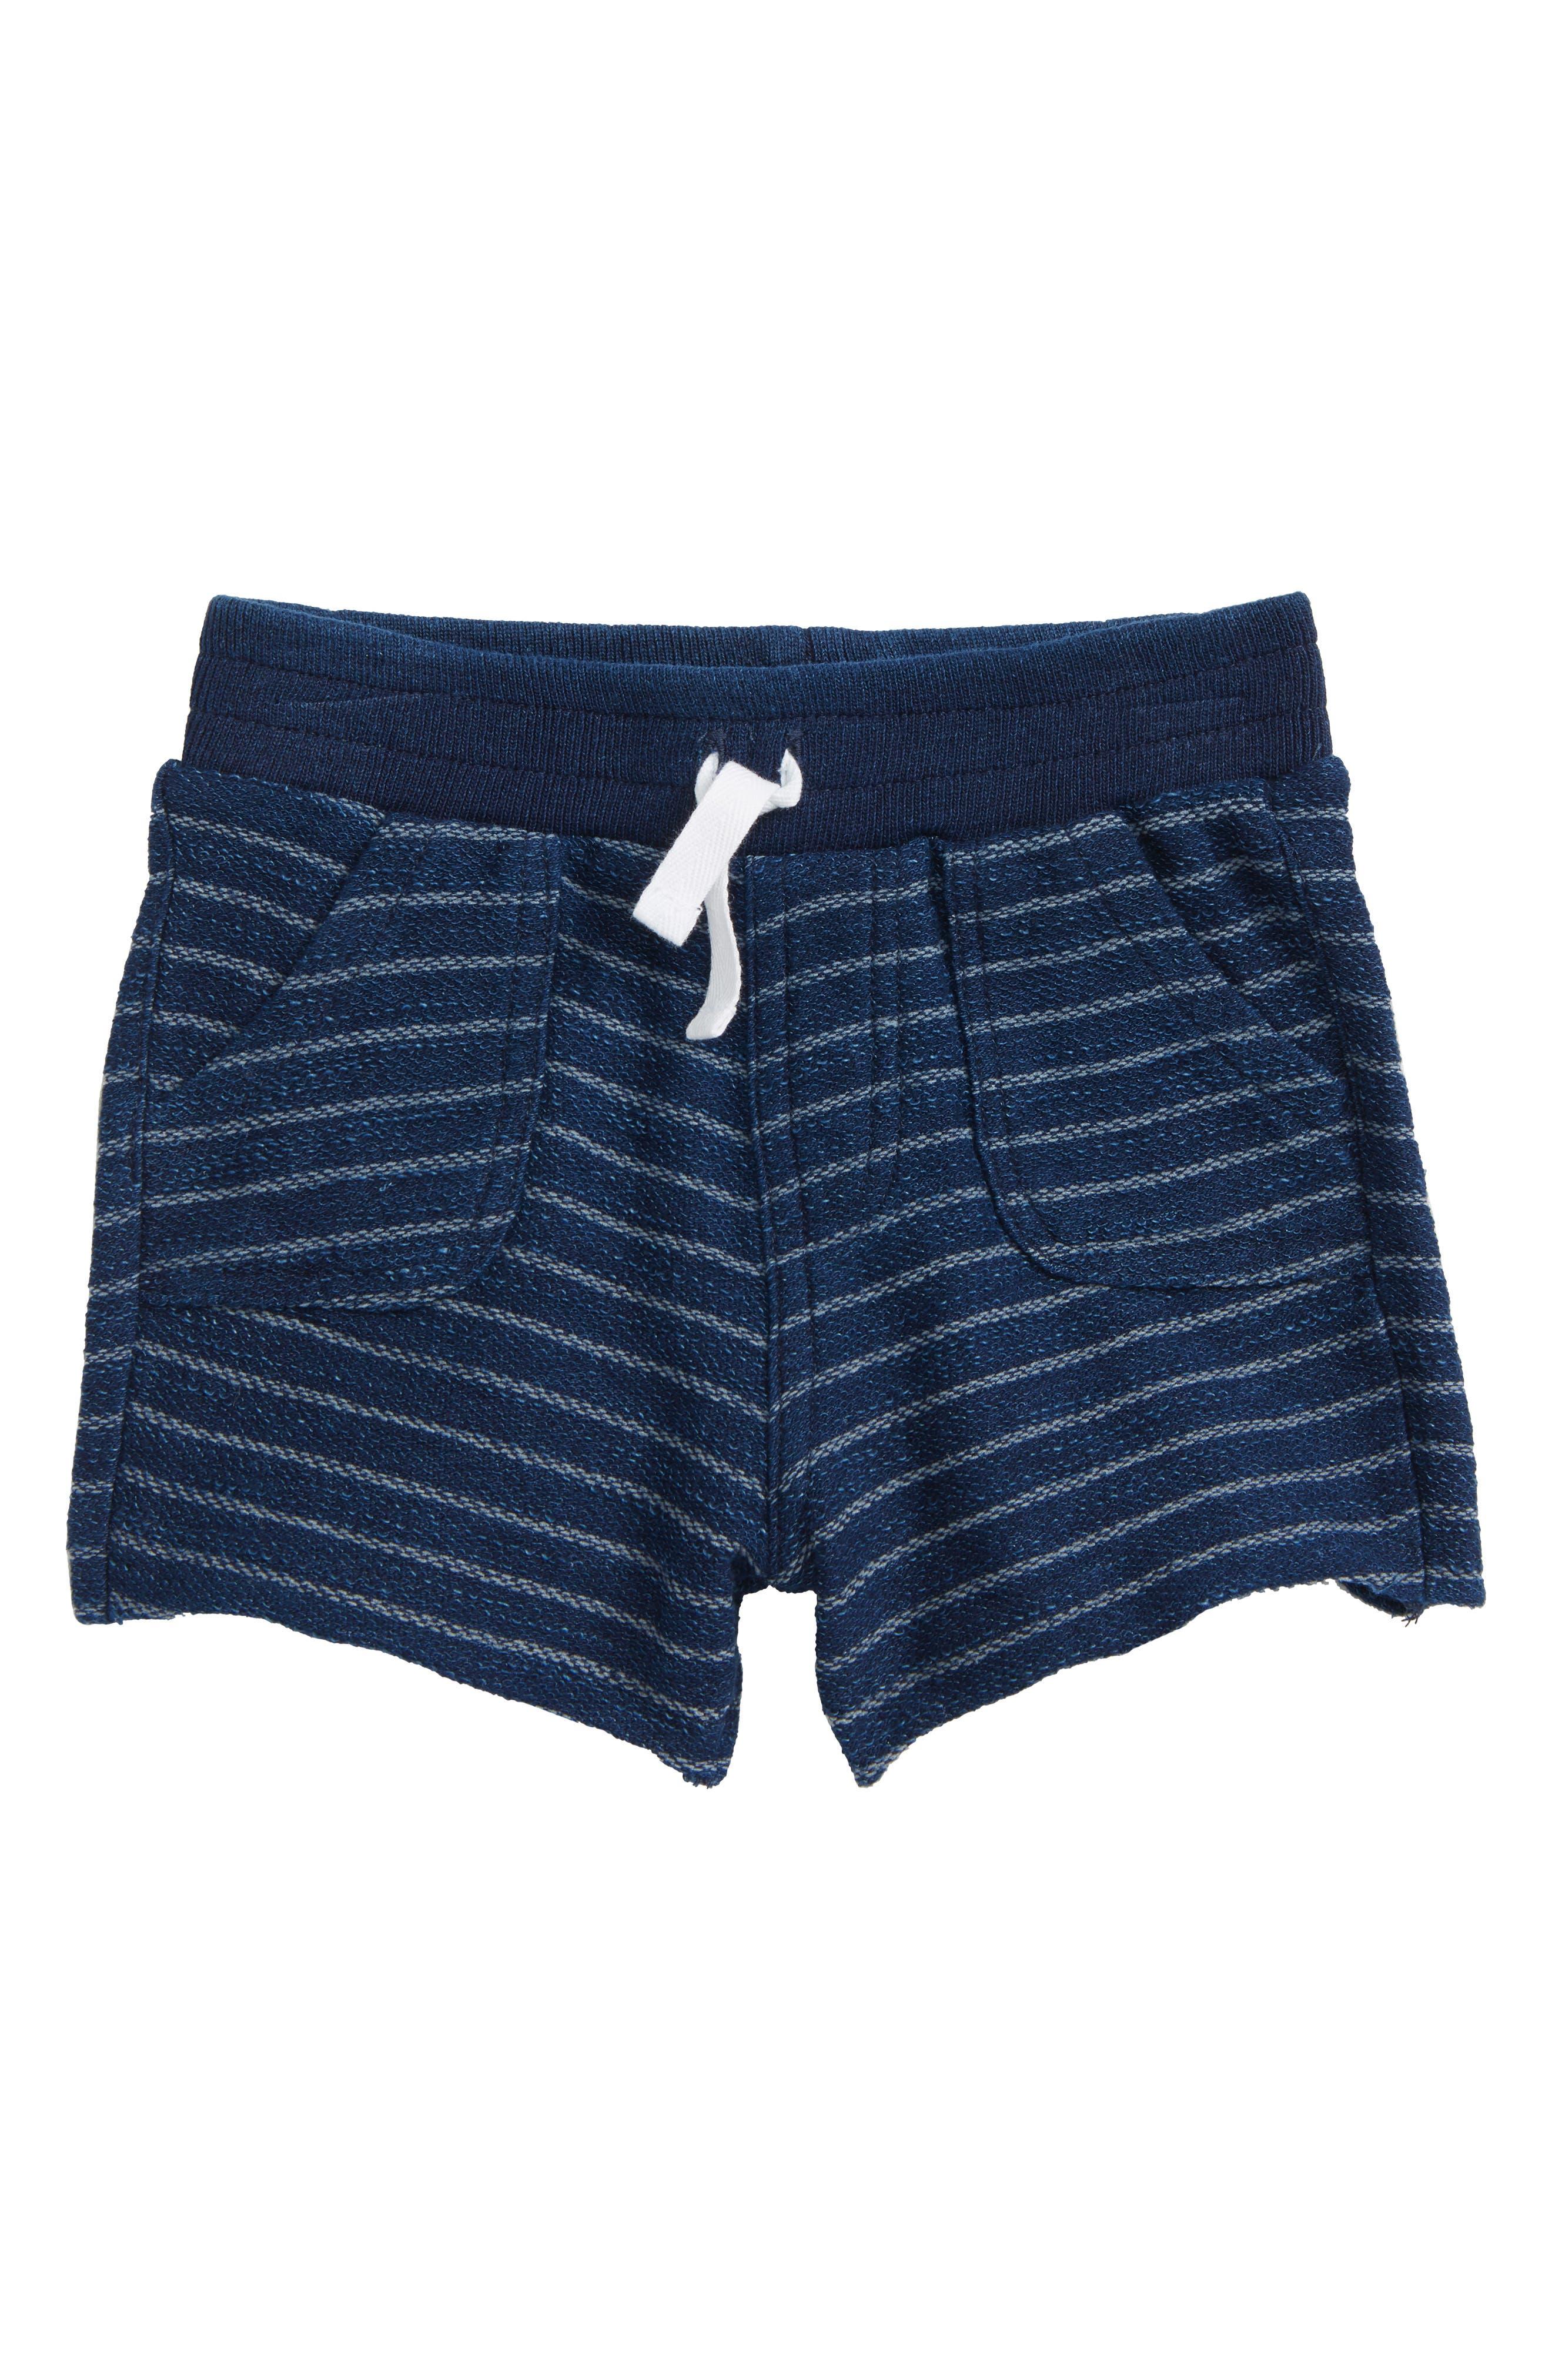 Indigo Stripe French Terry Shorts,                         Main,                         color, 400